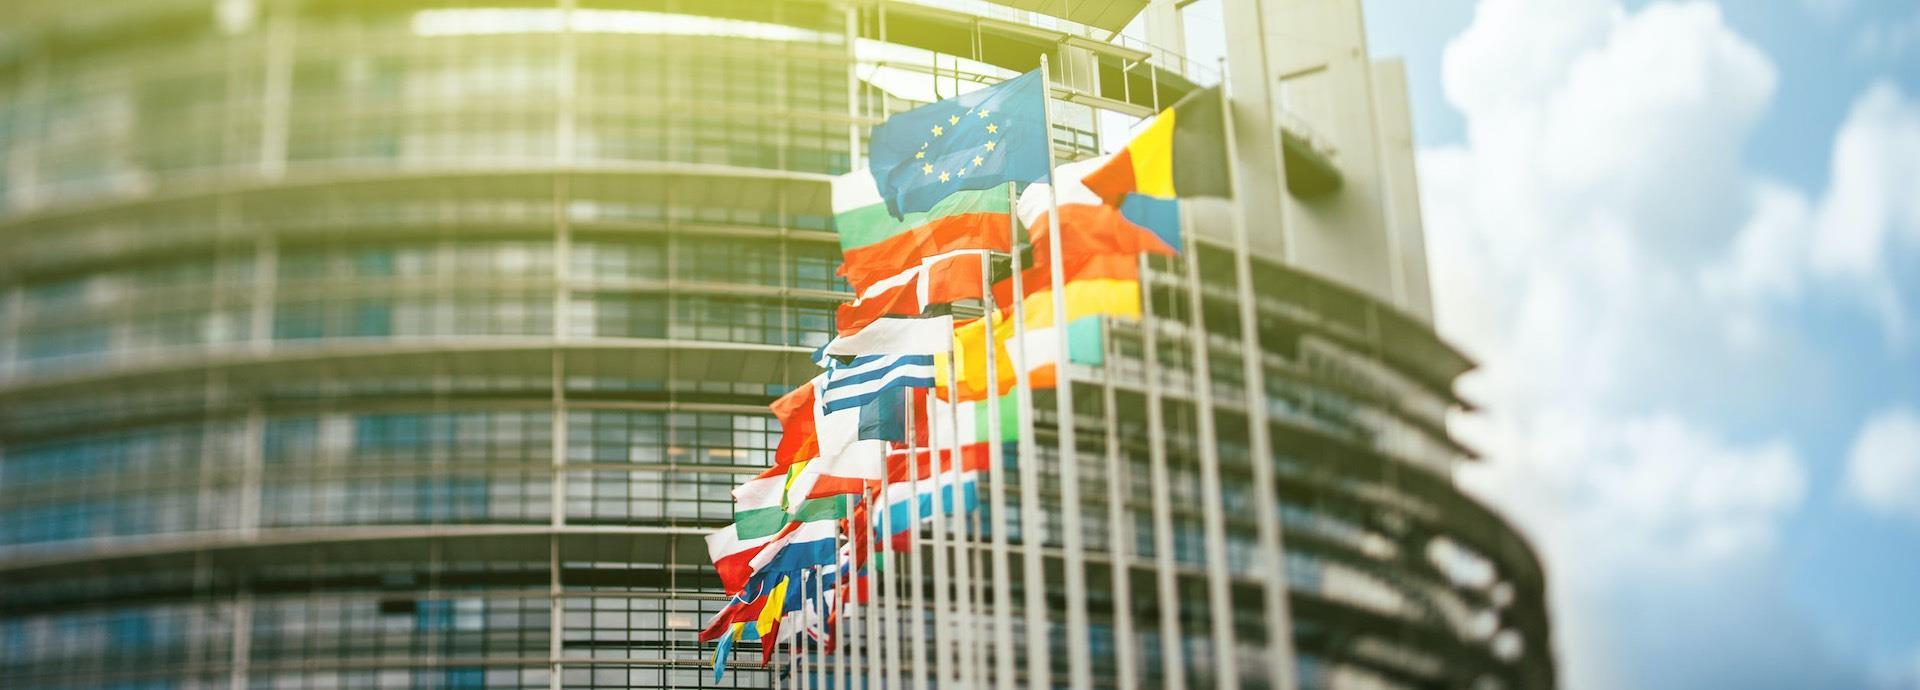 EU flags in Strasbourg